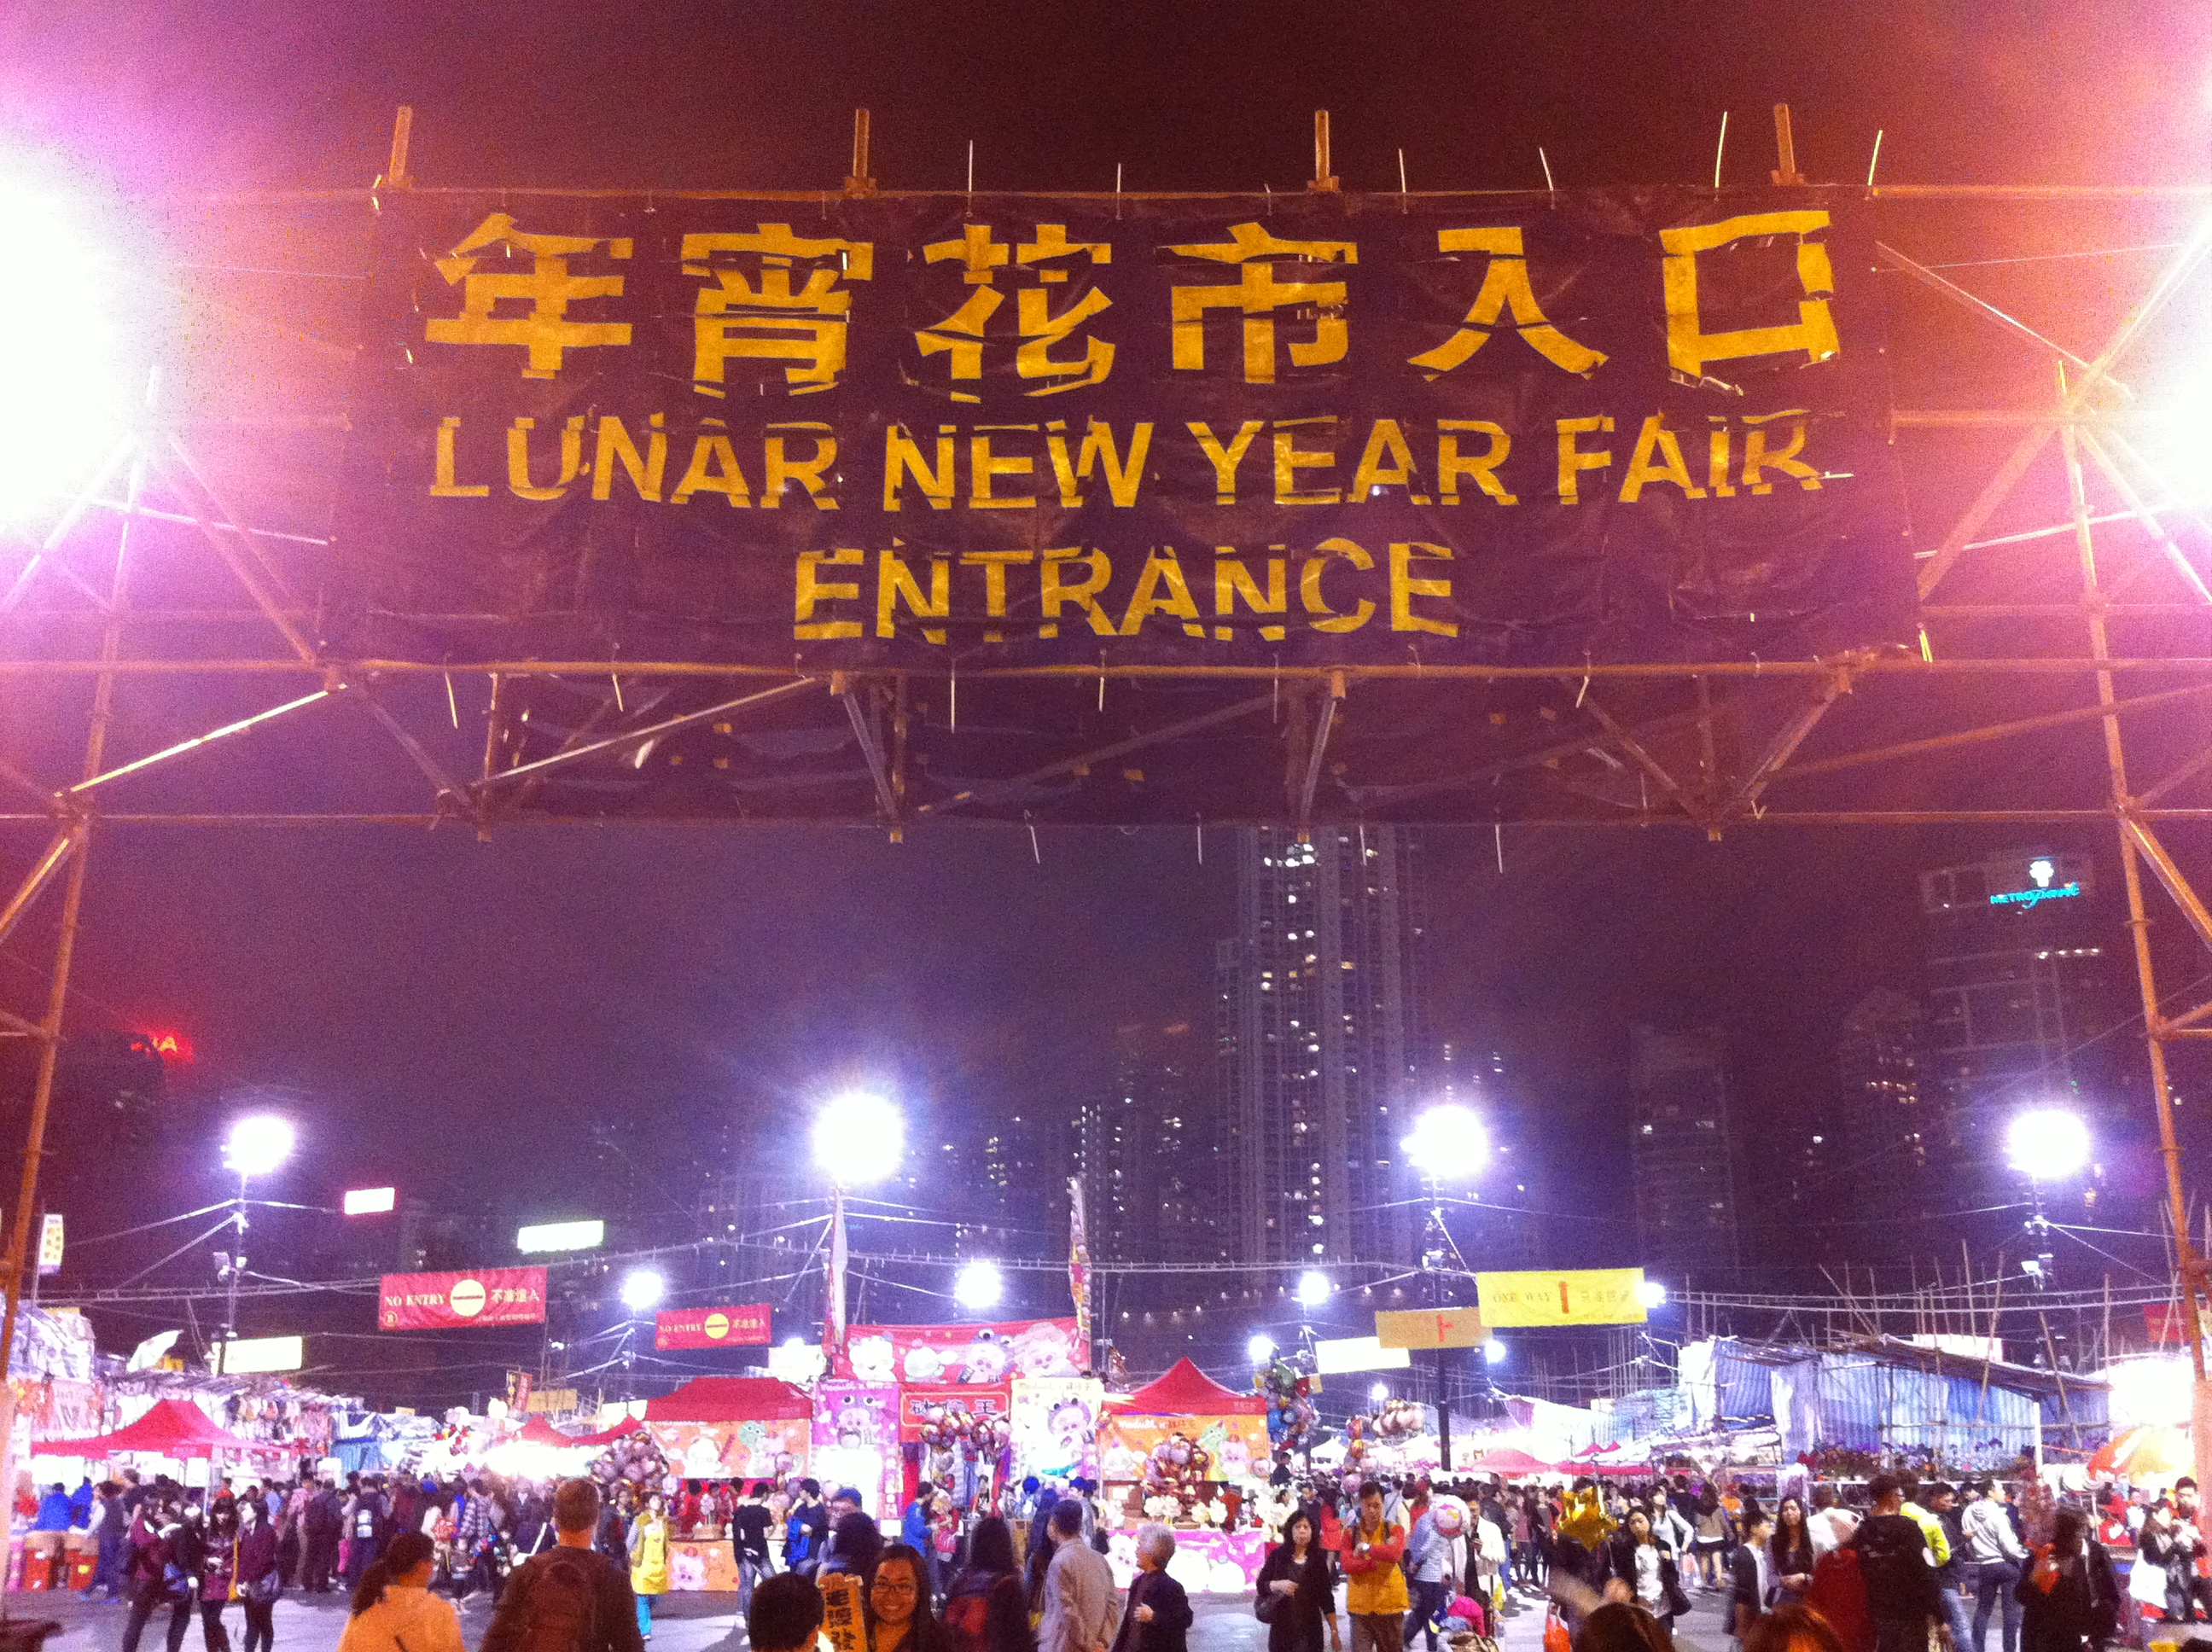 business plan for lunar new year fair stall in hong kong